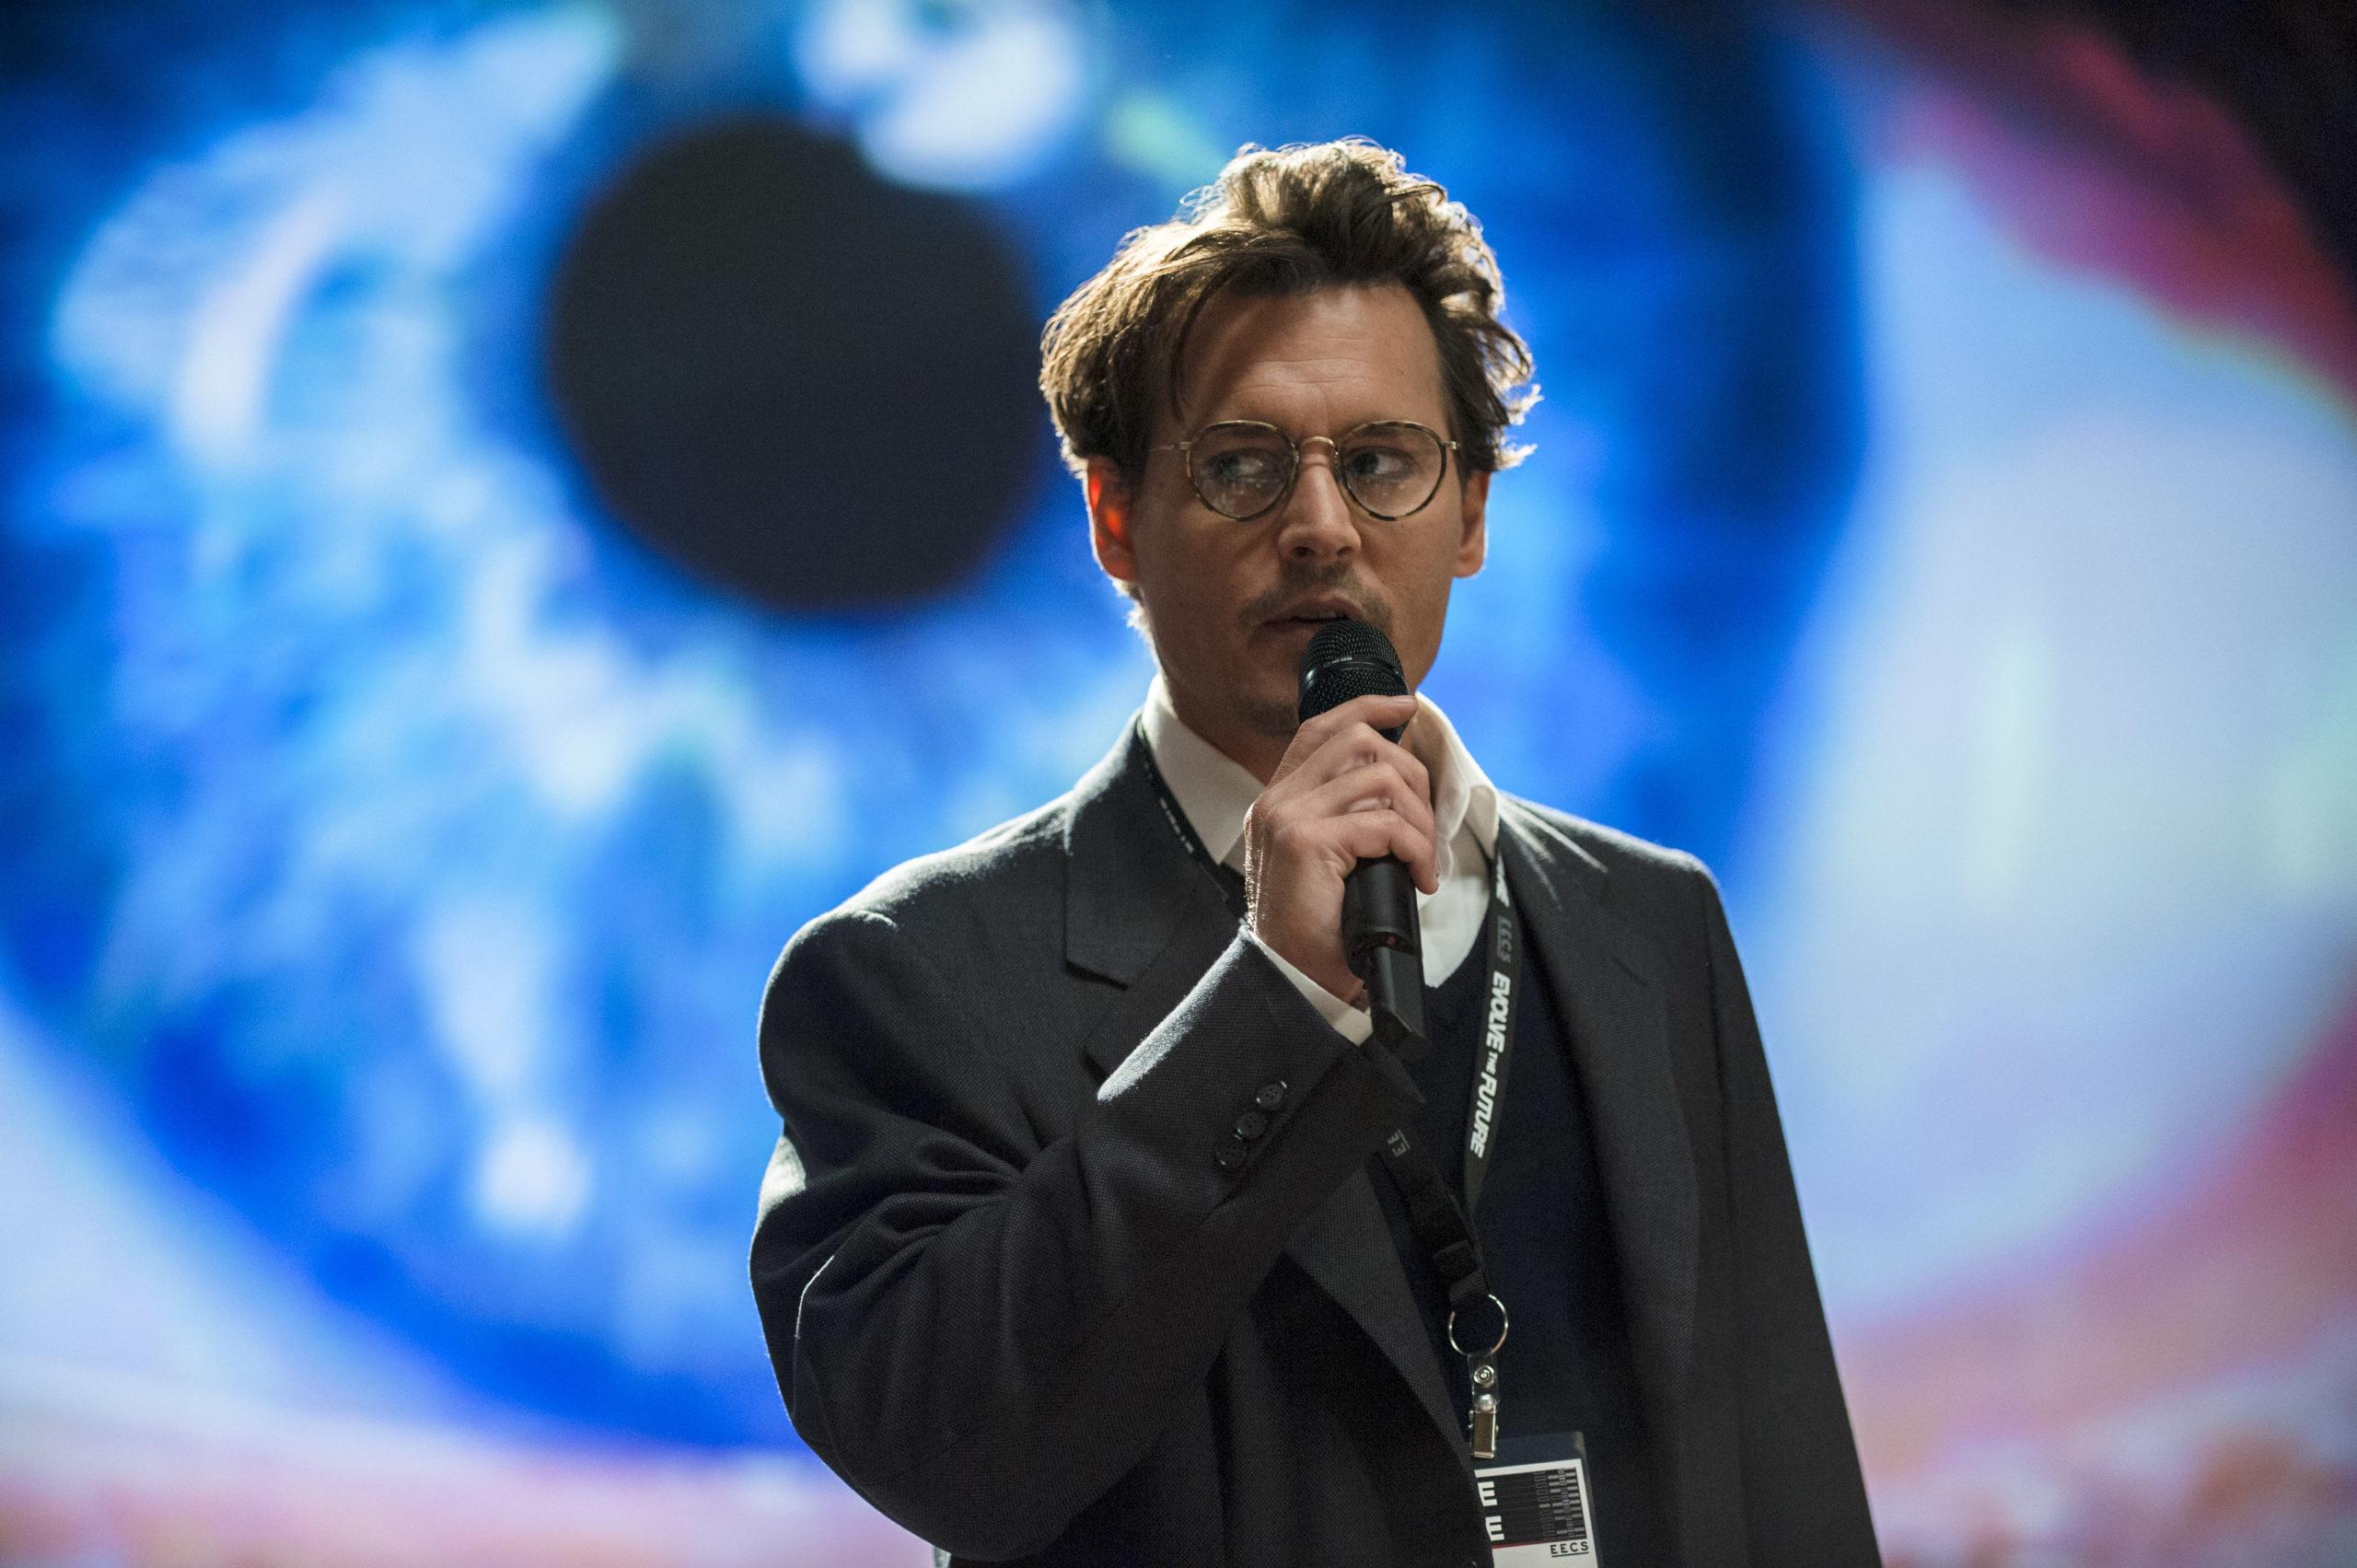 Johnny Depp movies The Sun Libel Case